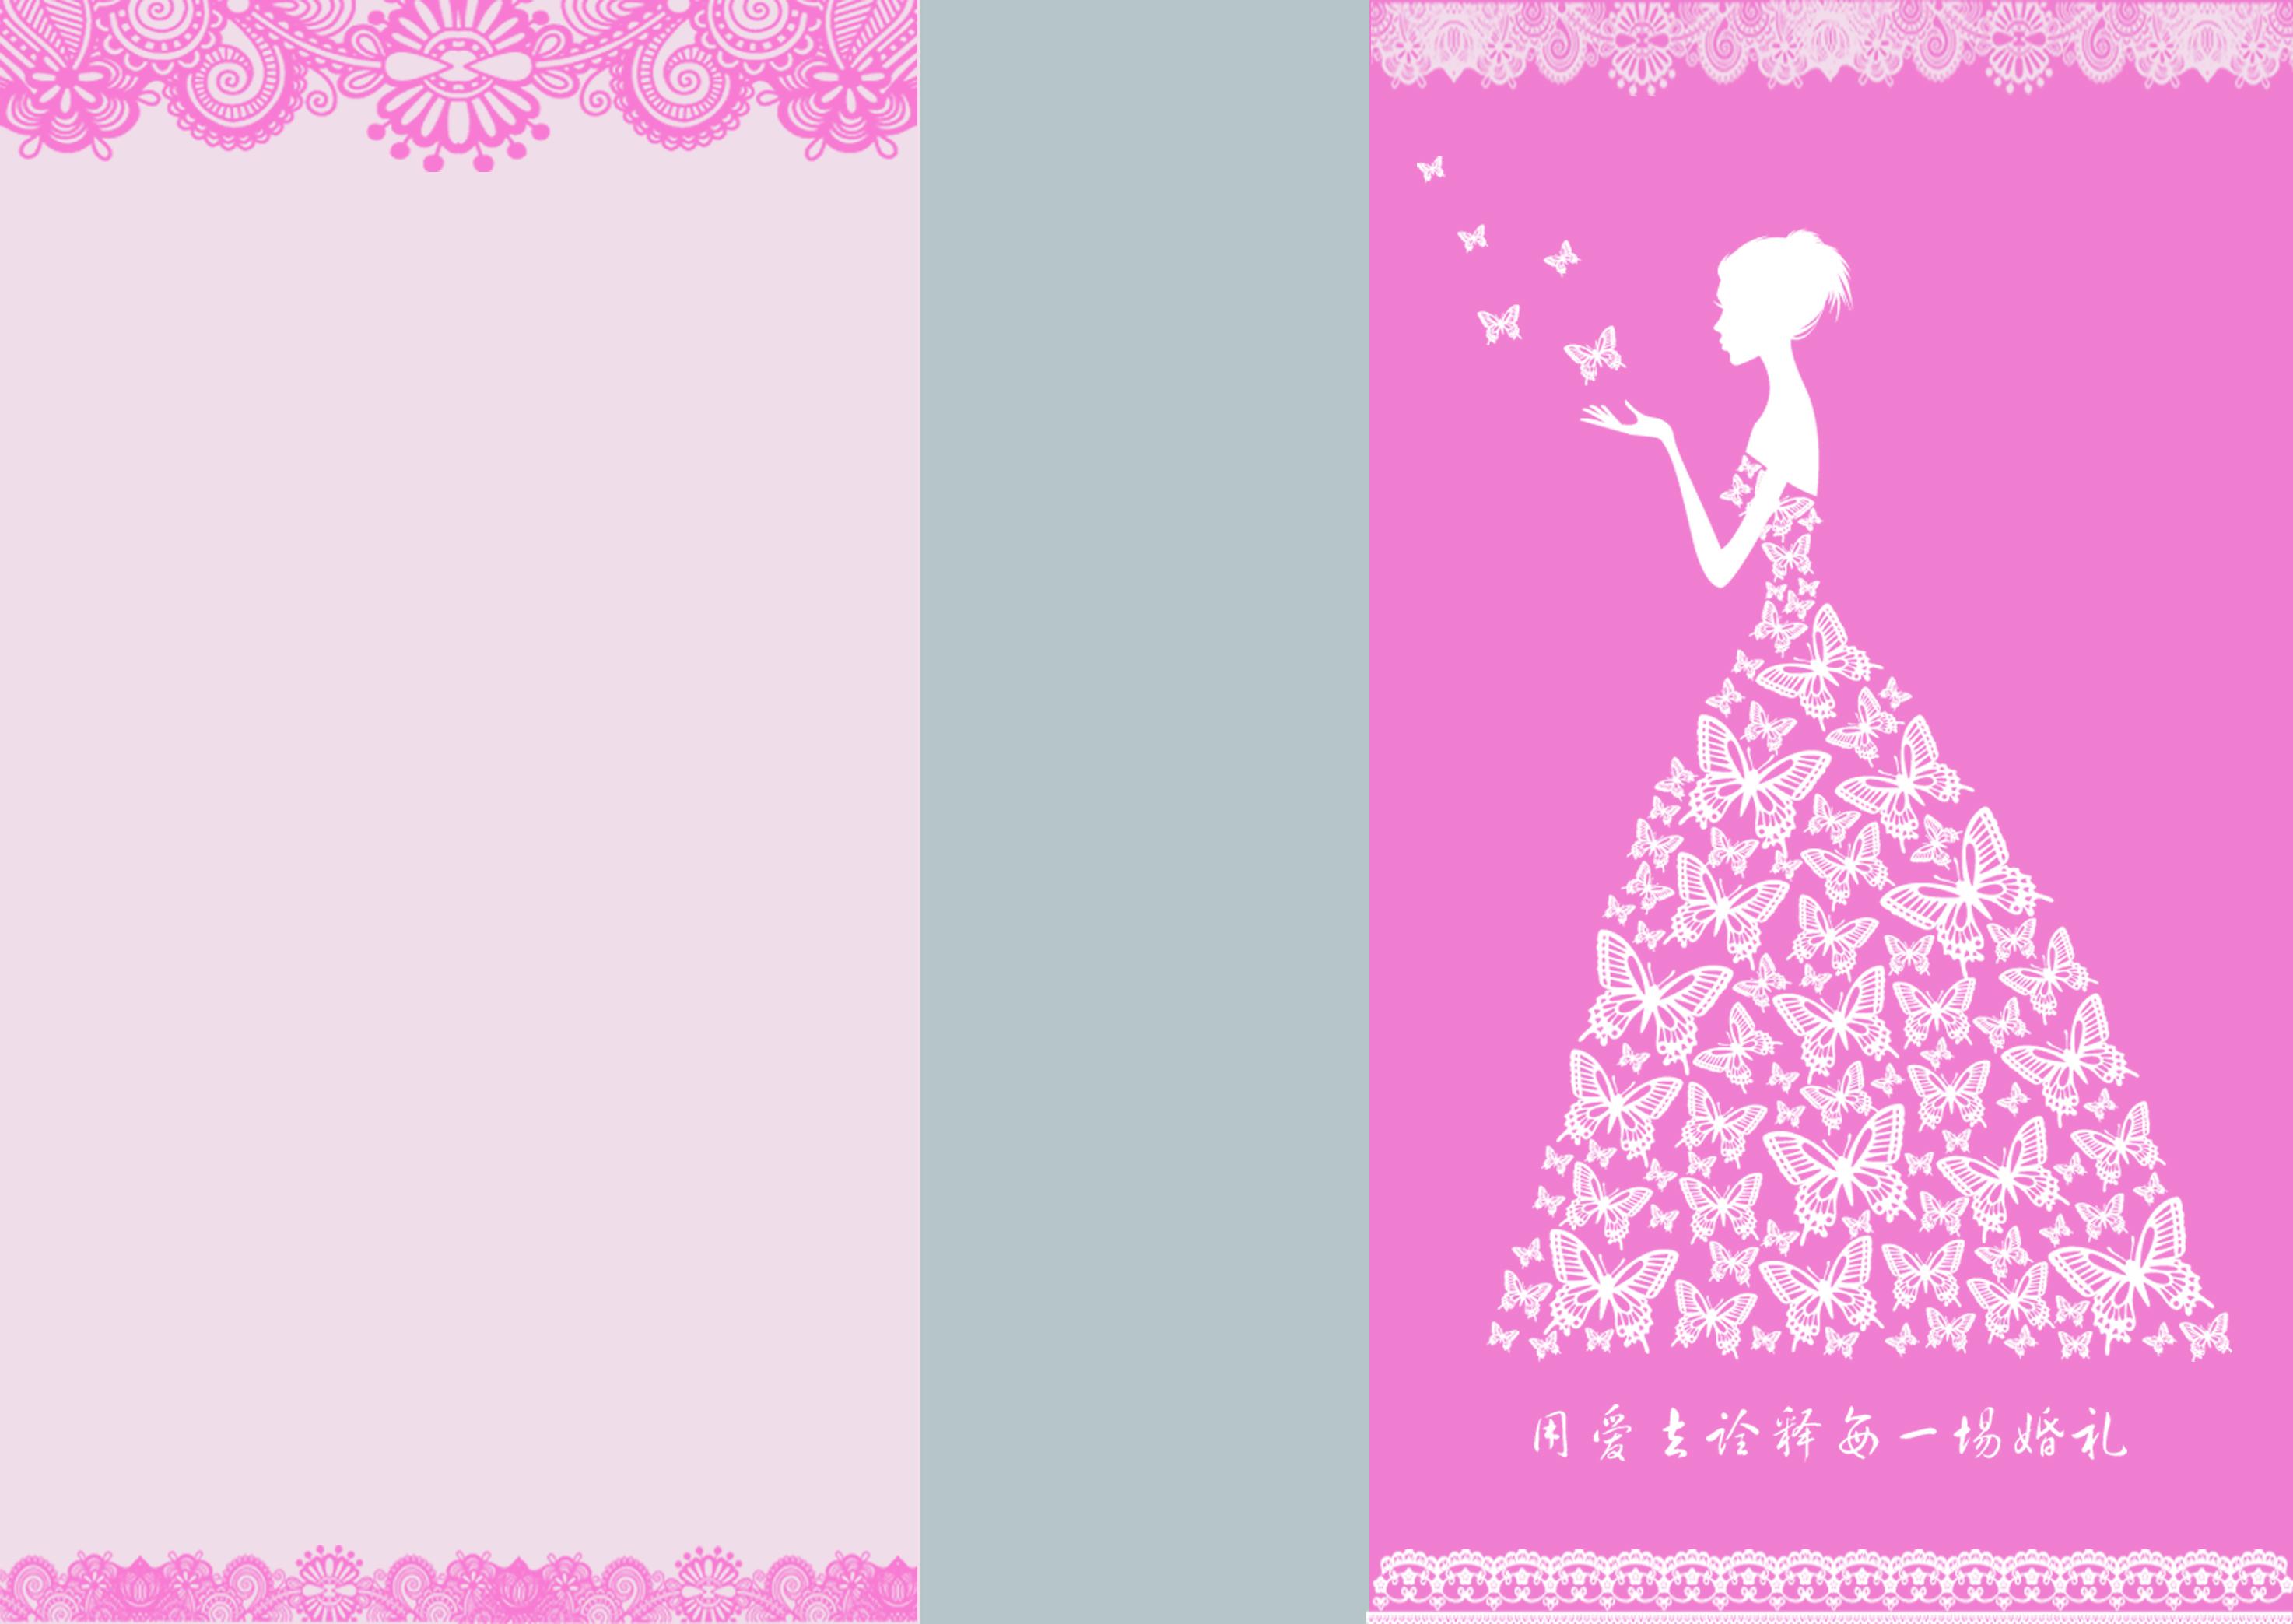 Wedding Invitation Card Background: Creative Wedding Invitation Card Background, Wedding